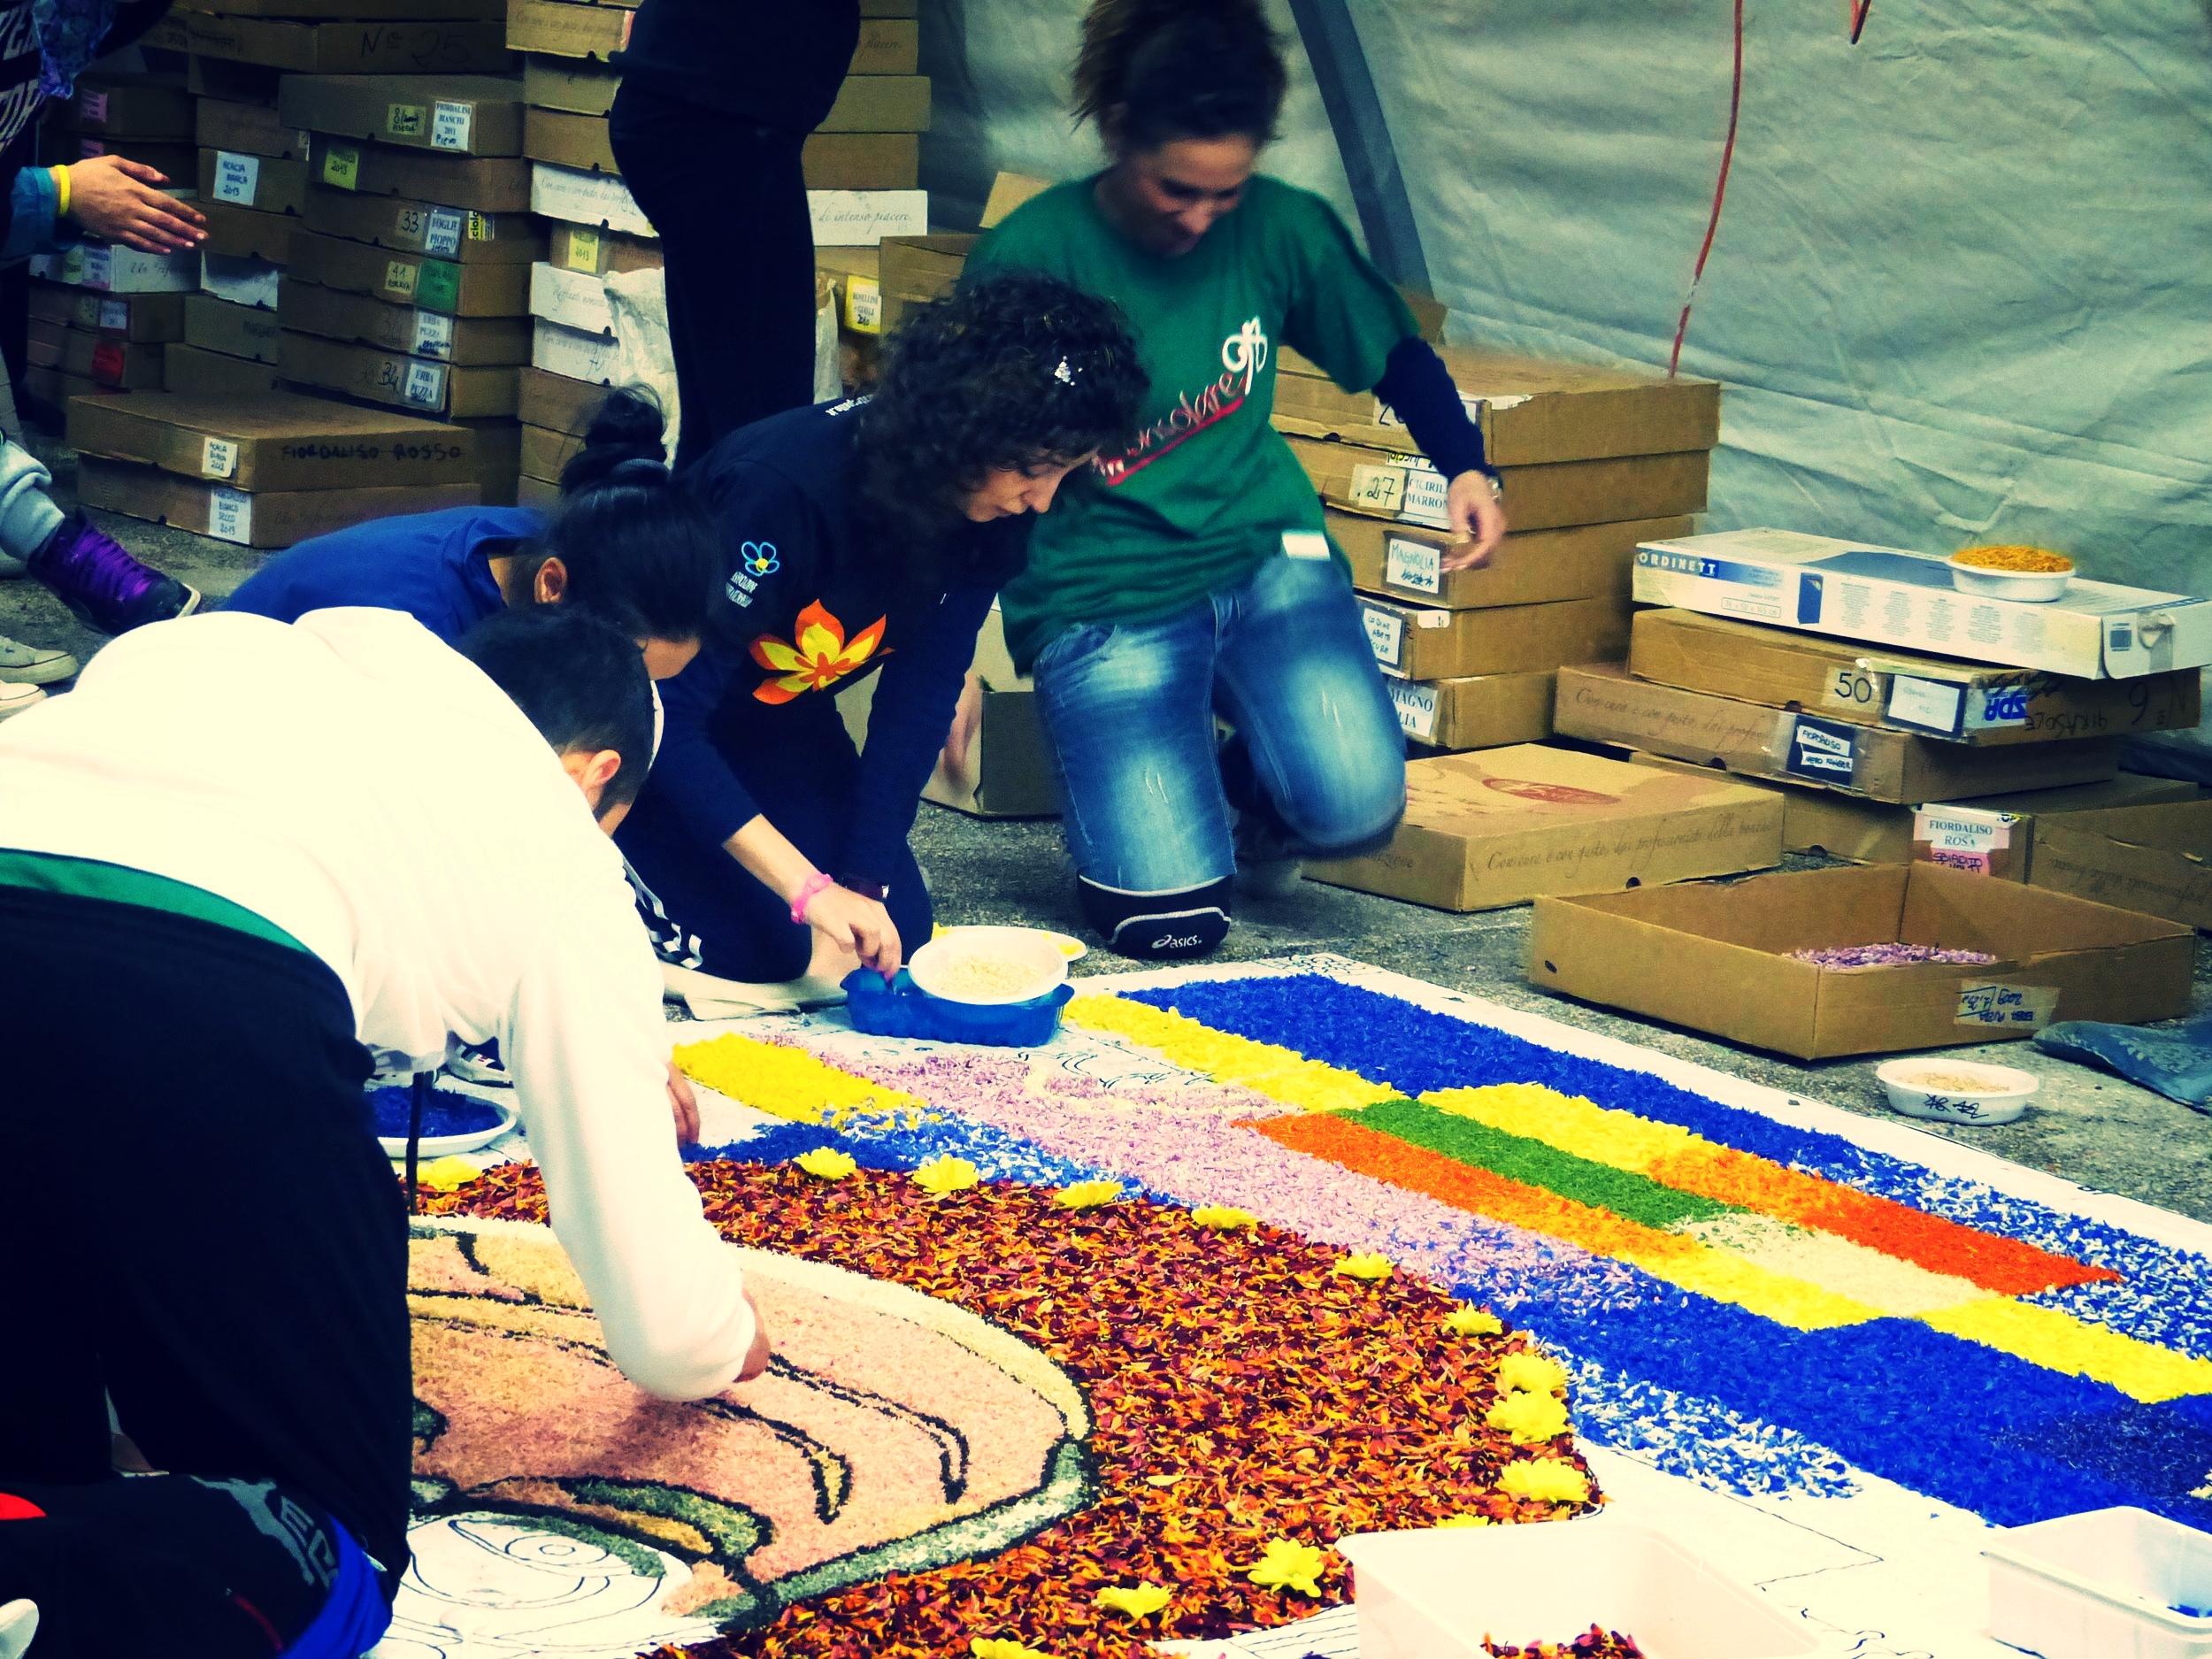 Working on Francis for Infiorata in Spello, Umbria